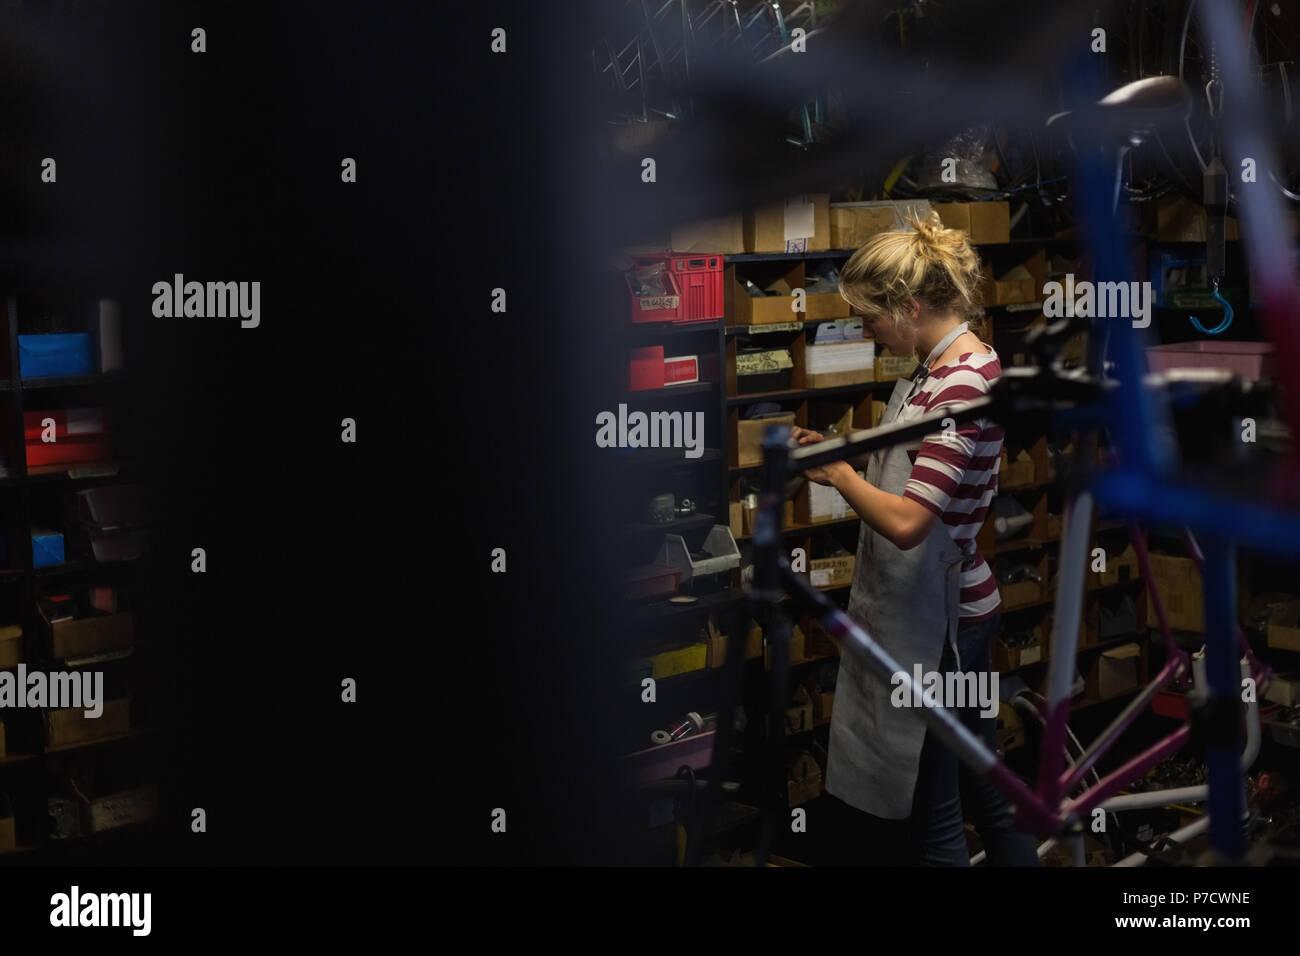 Mécanicien de sexe féminin travaillant en atelier Photo Stock